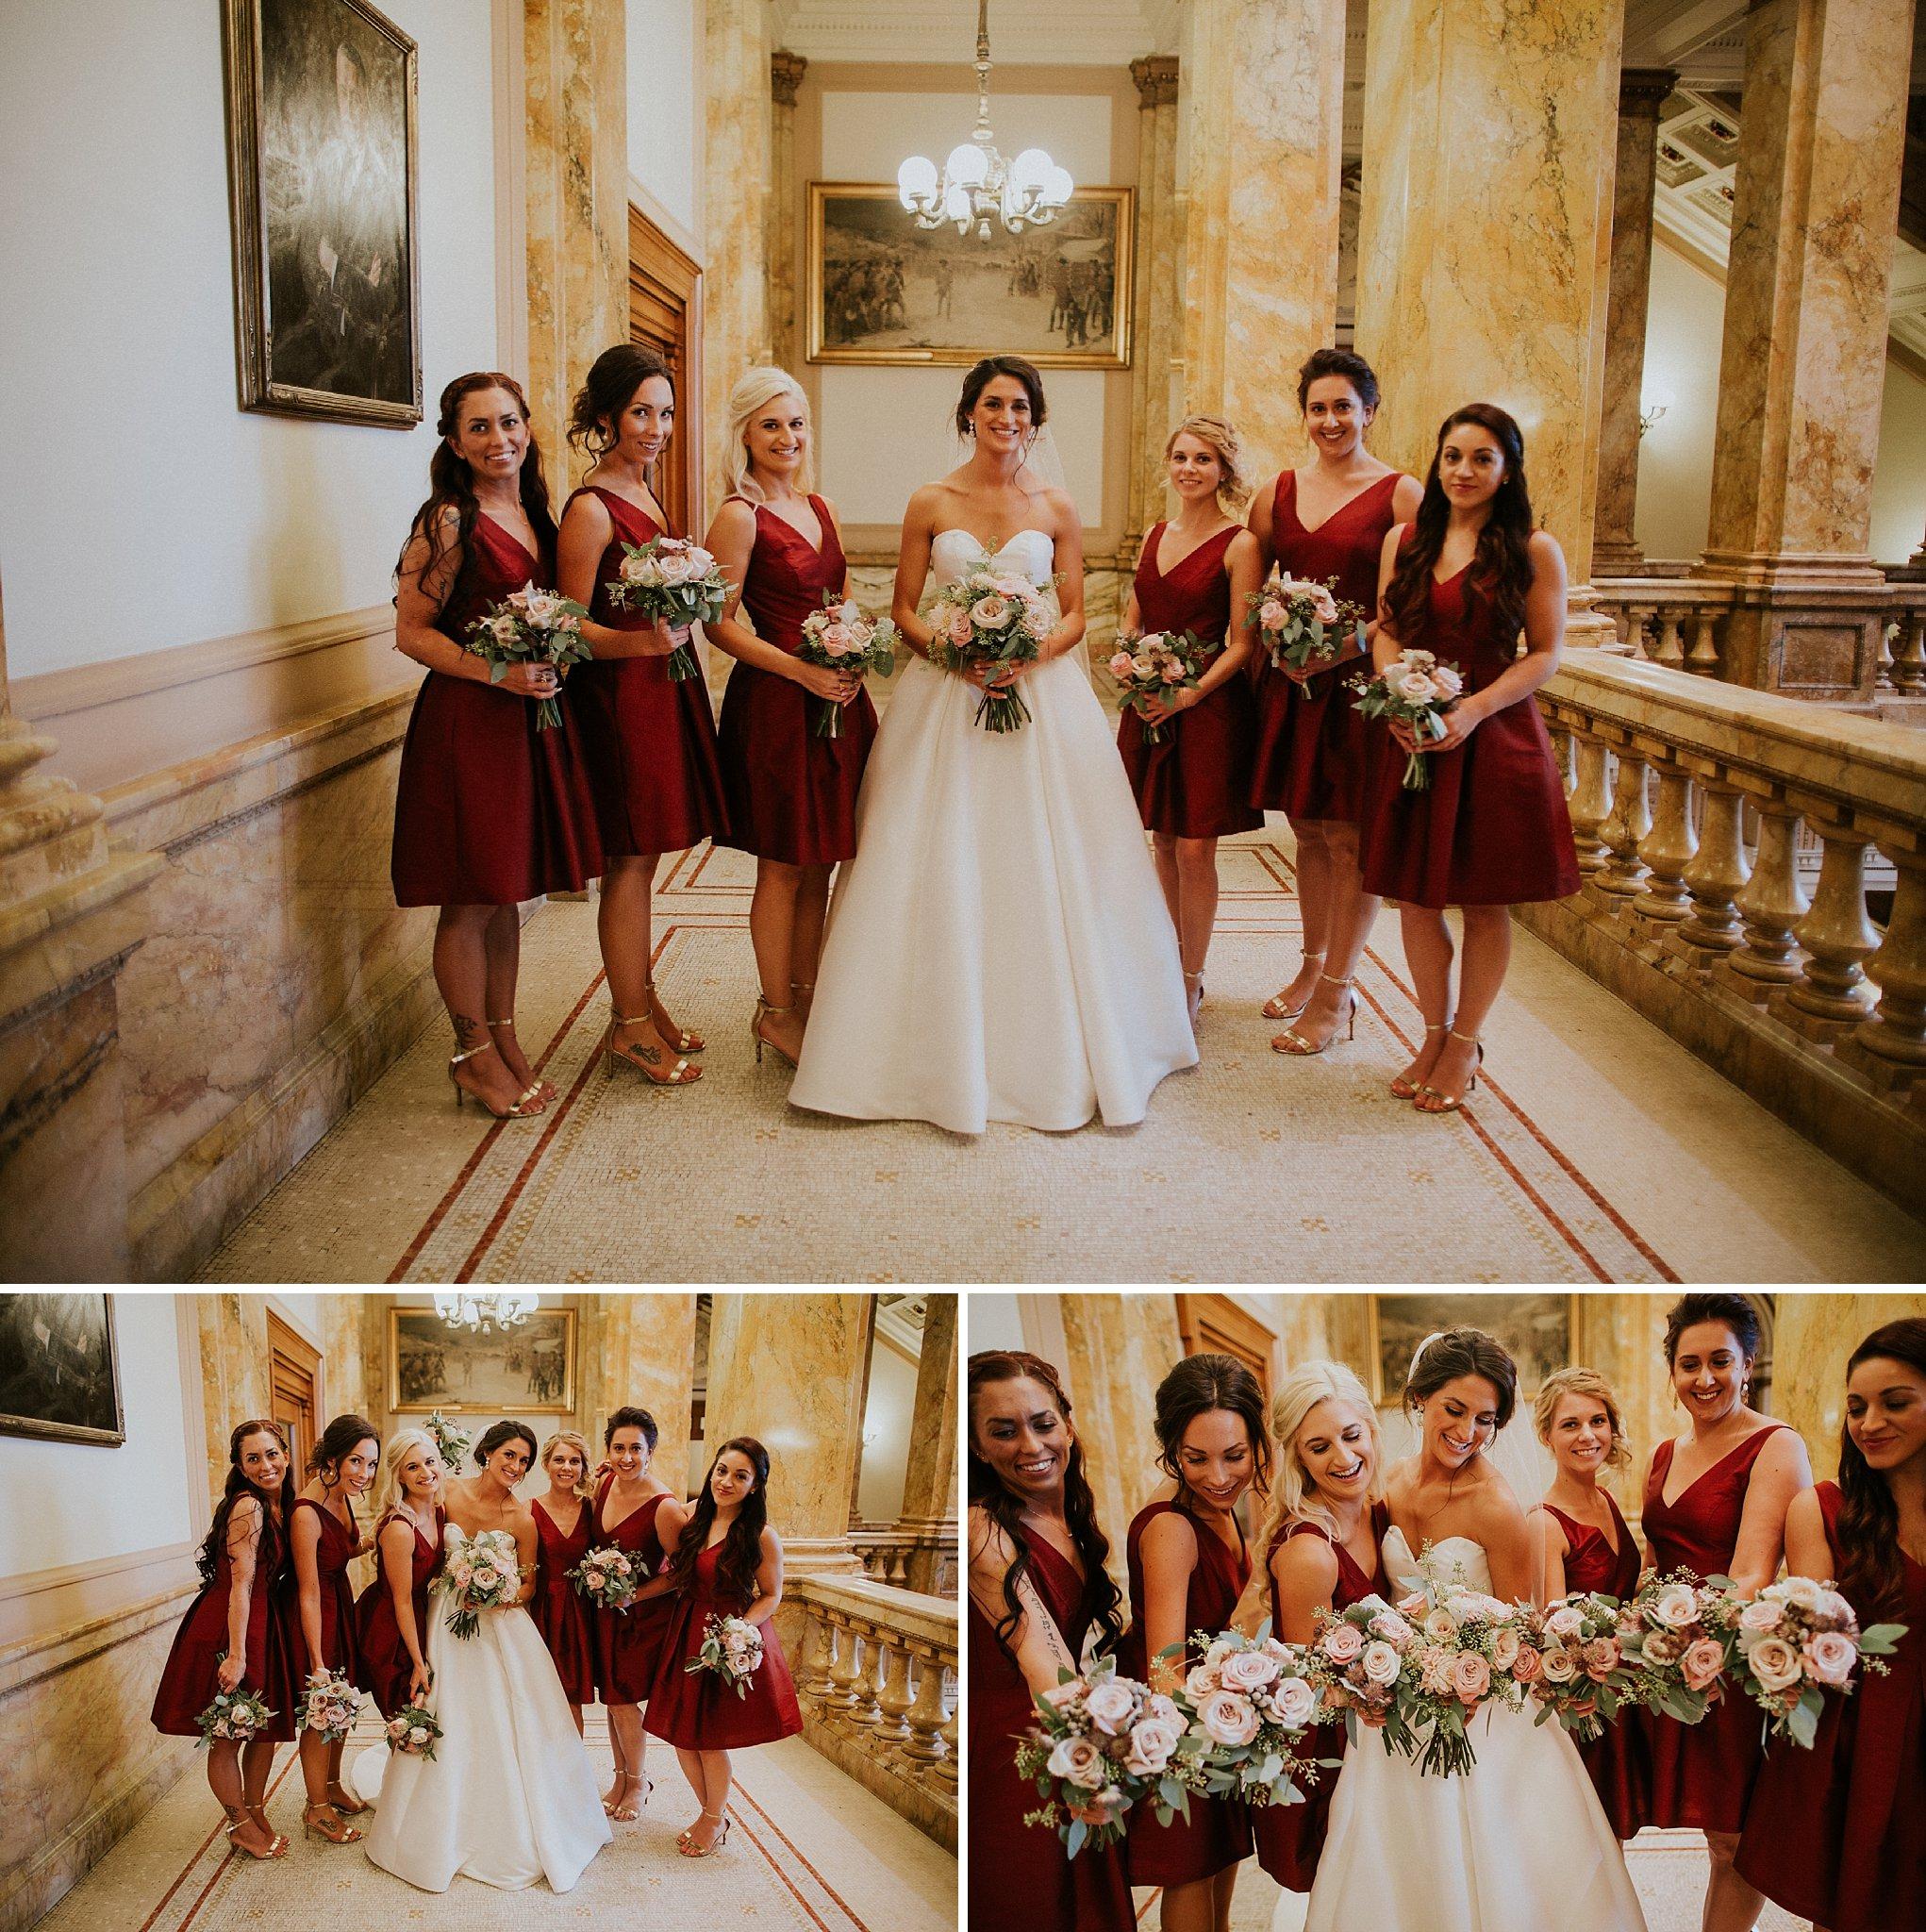 Matt-Lauren_St-Marys_Hilton-City-Center-Milwaukee-Wedding_liller-photo_0053.jpg